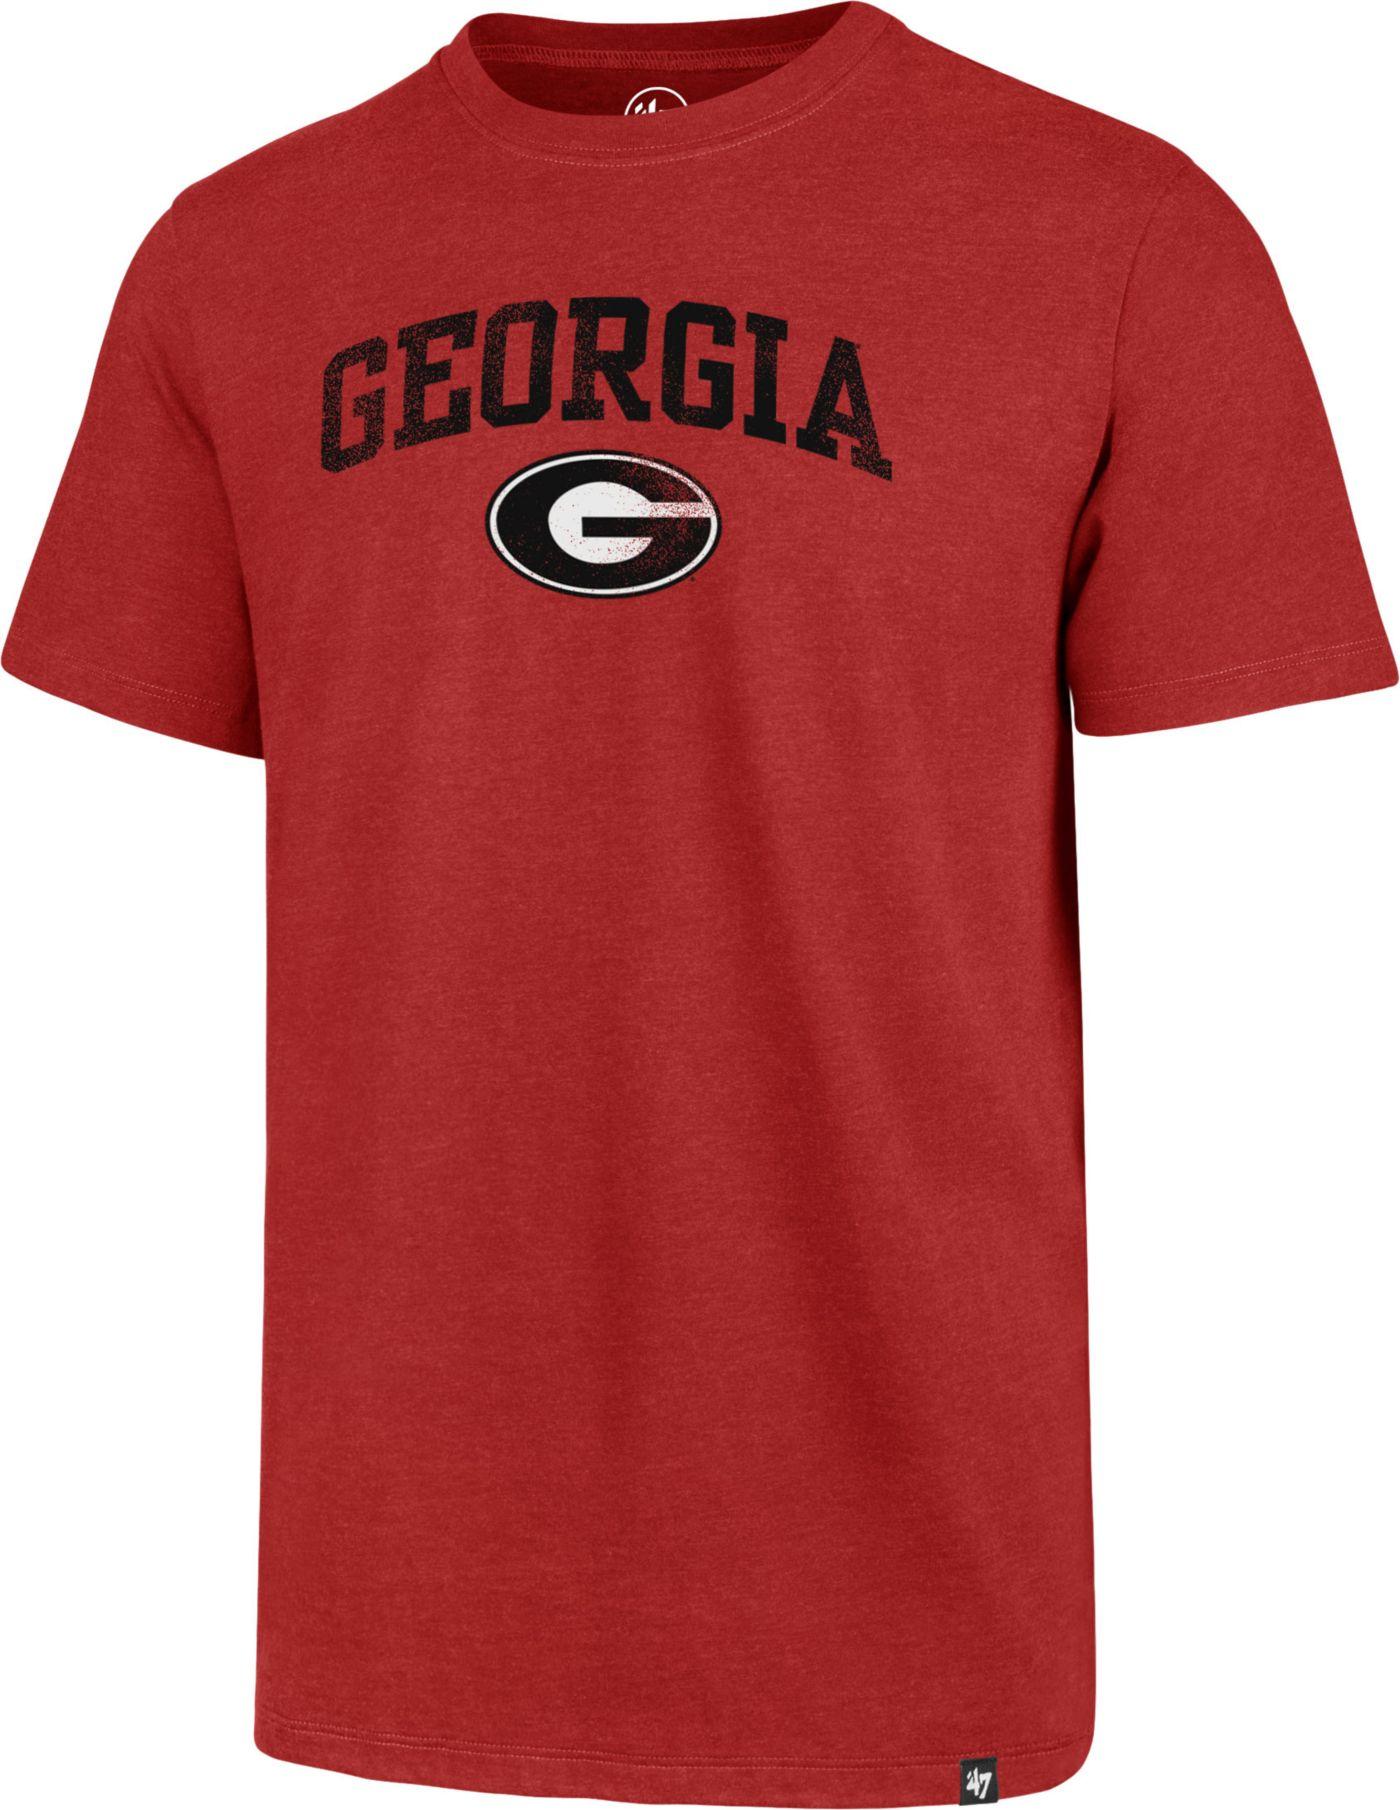 '47 Men's Georgia Bulldogs Red Club T-Shirt